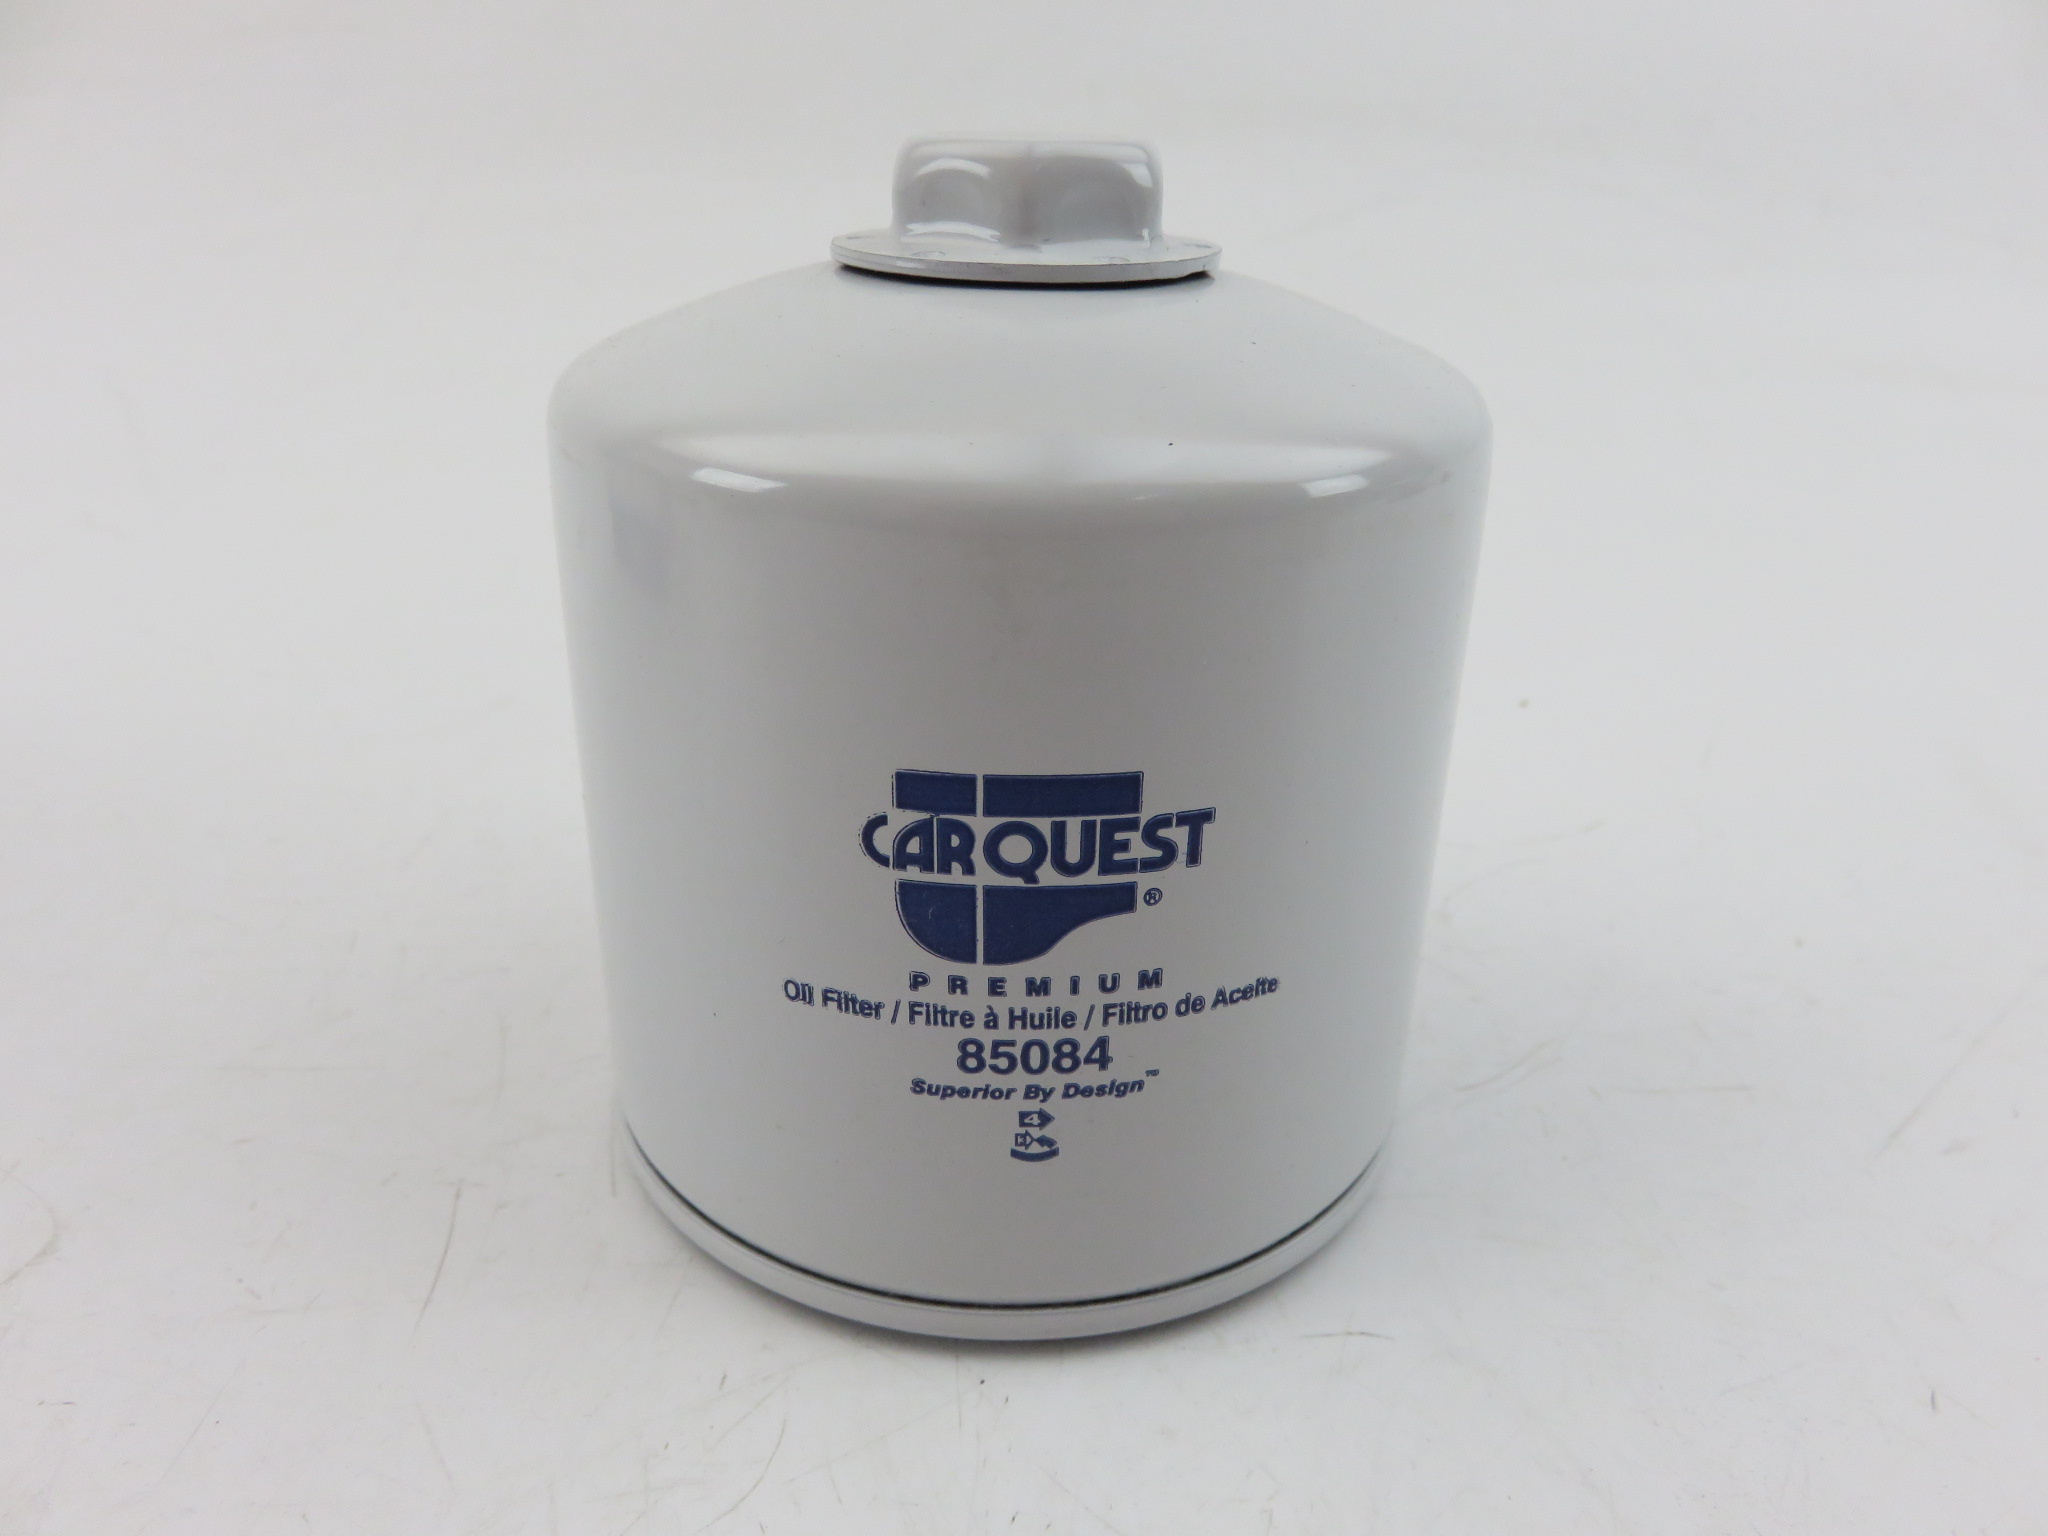 Gm 19160689 For Aspen Voyager Caravan Nitro Engine Oil Filter Carquest 8504 4110 Ebay